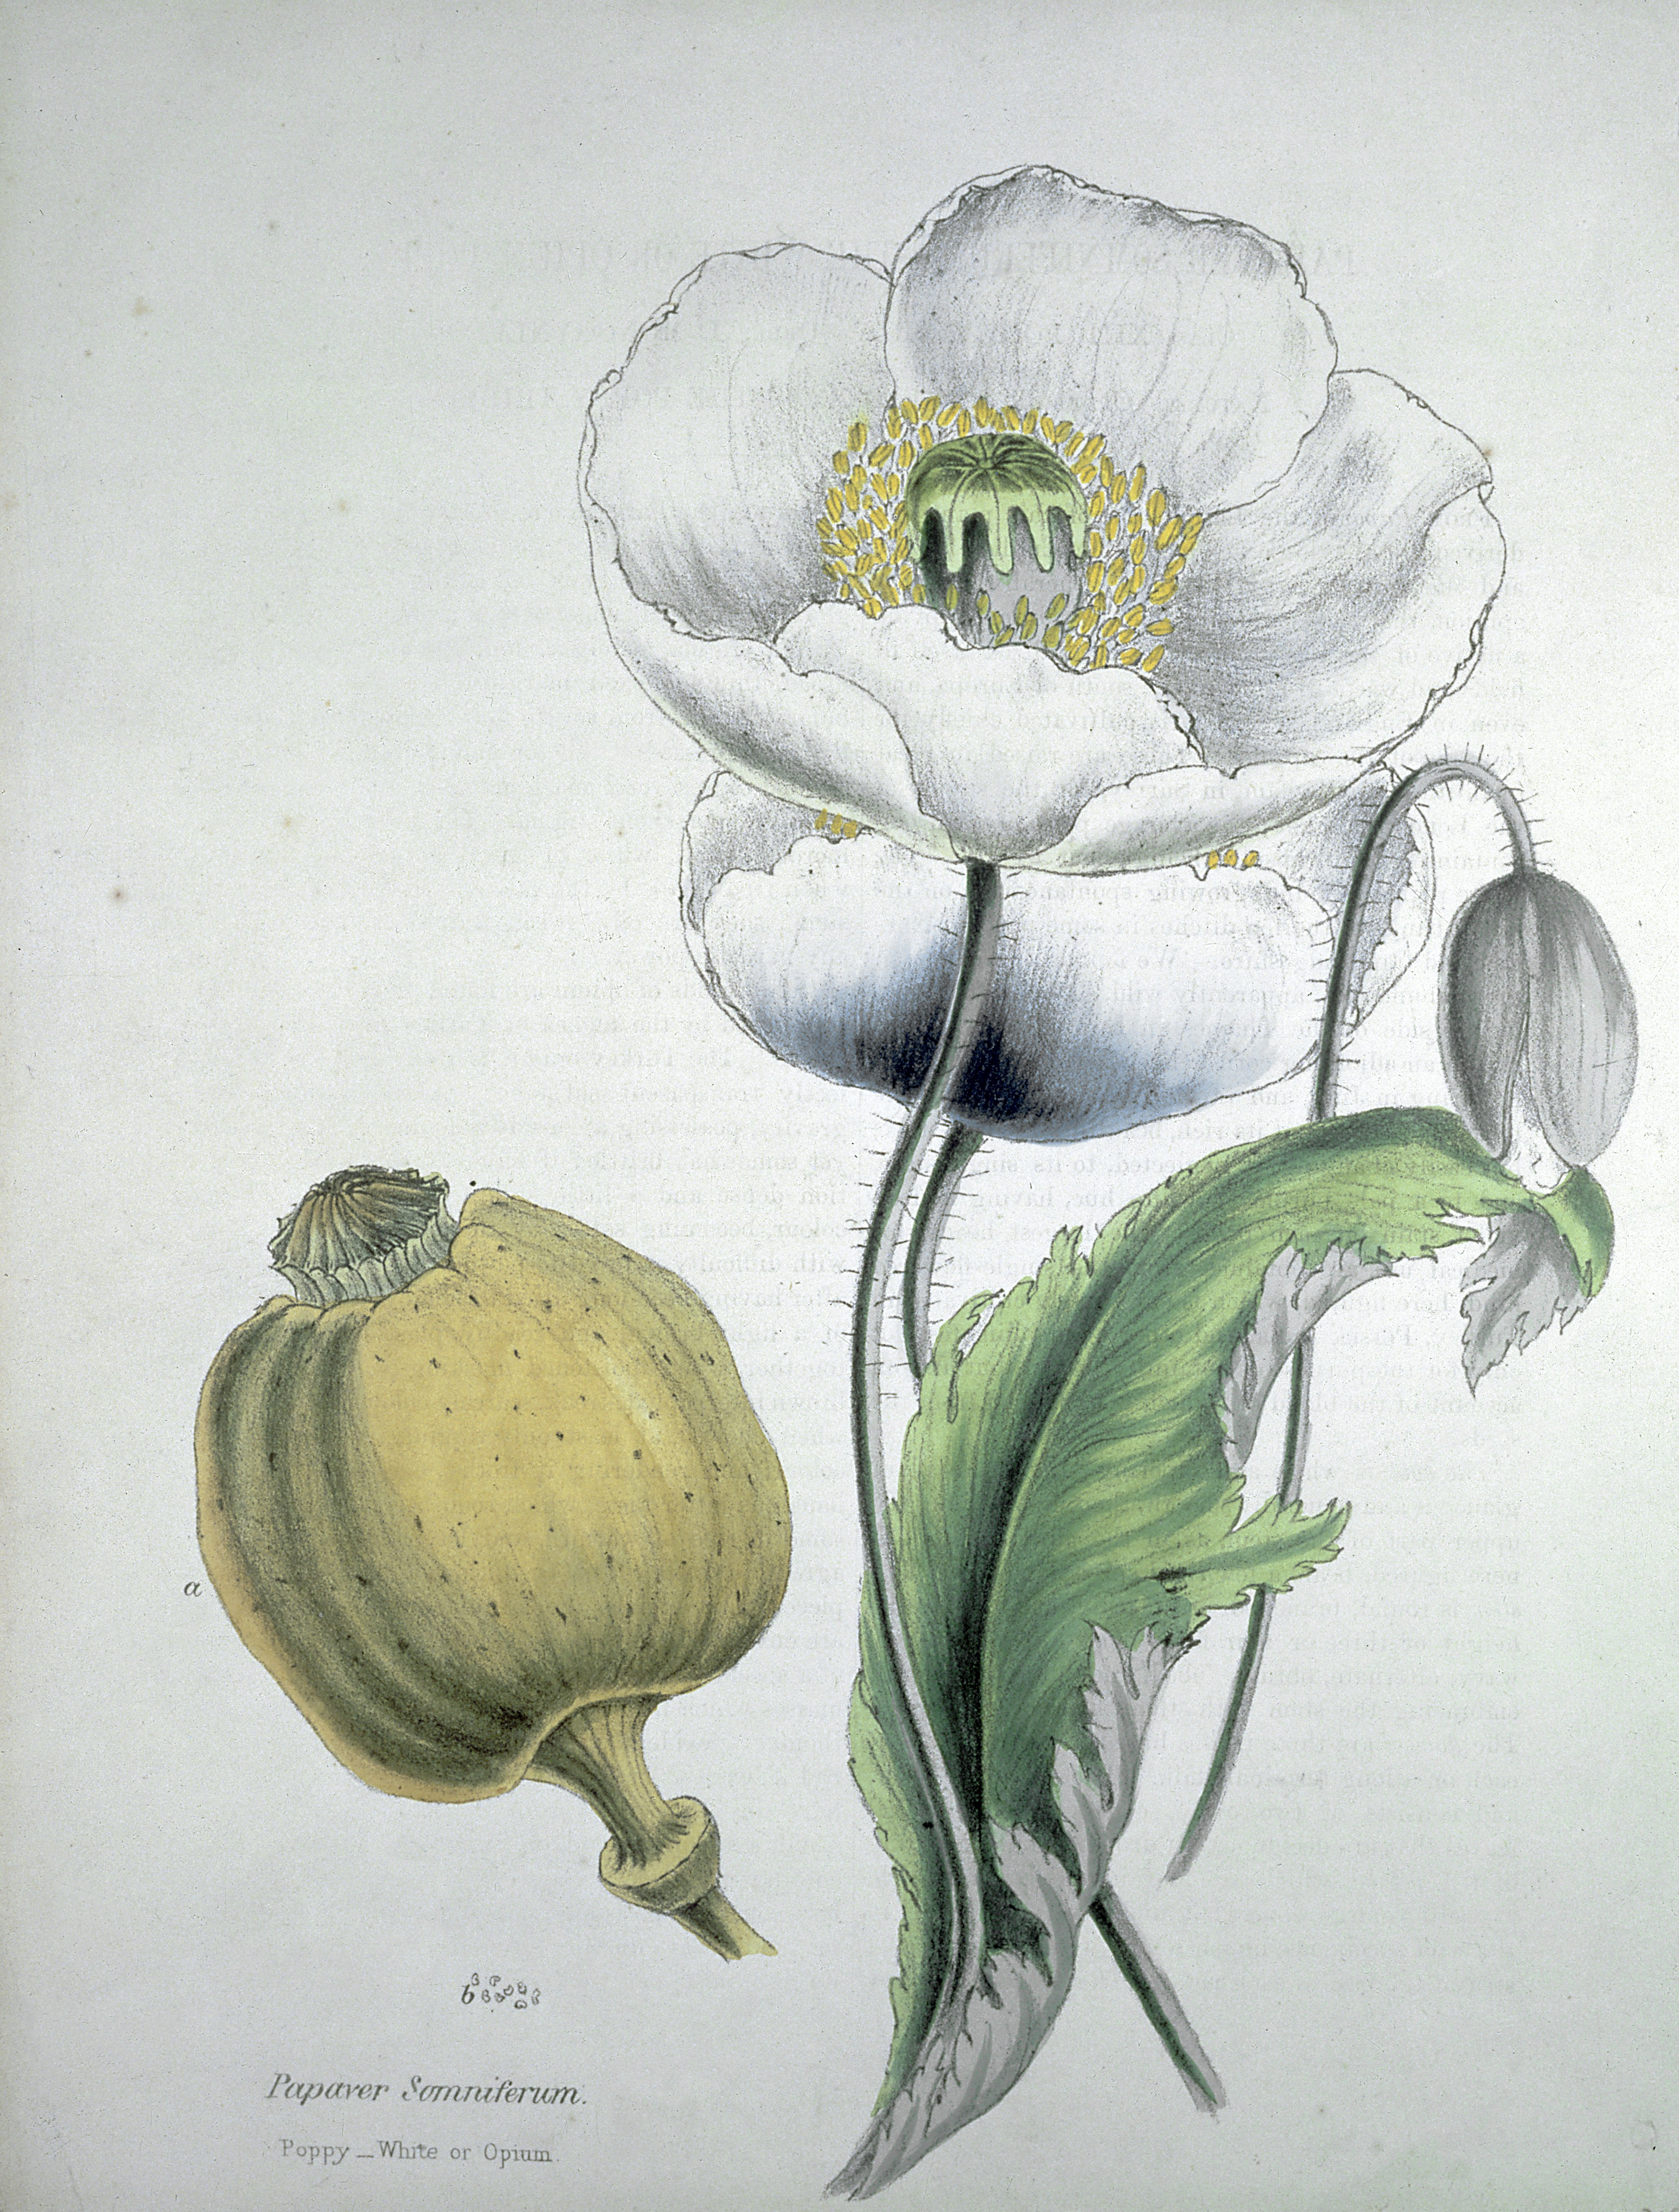 Fileopium Poppy Papaver Somniferum White Flowers Seed Wellcome